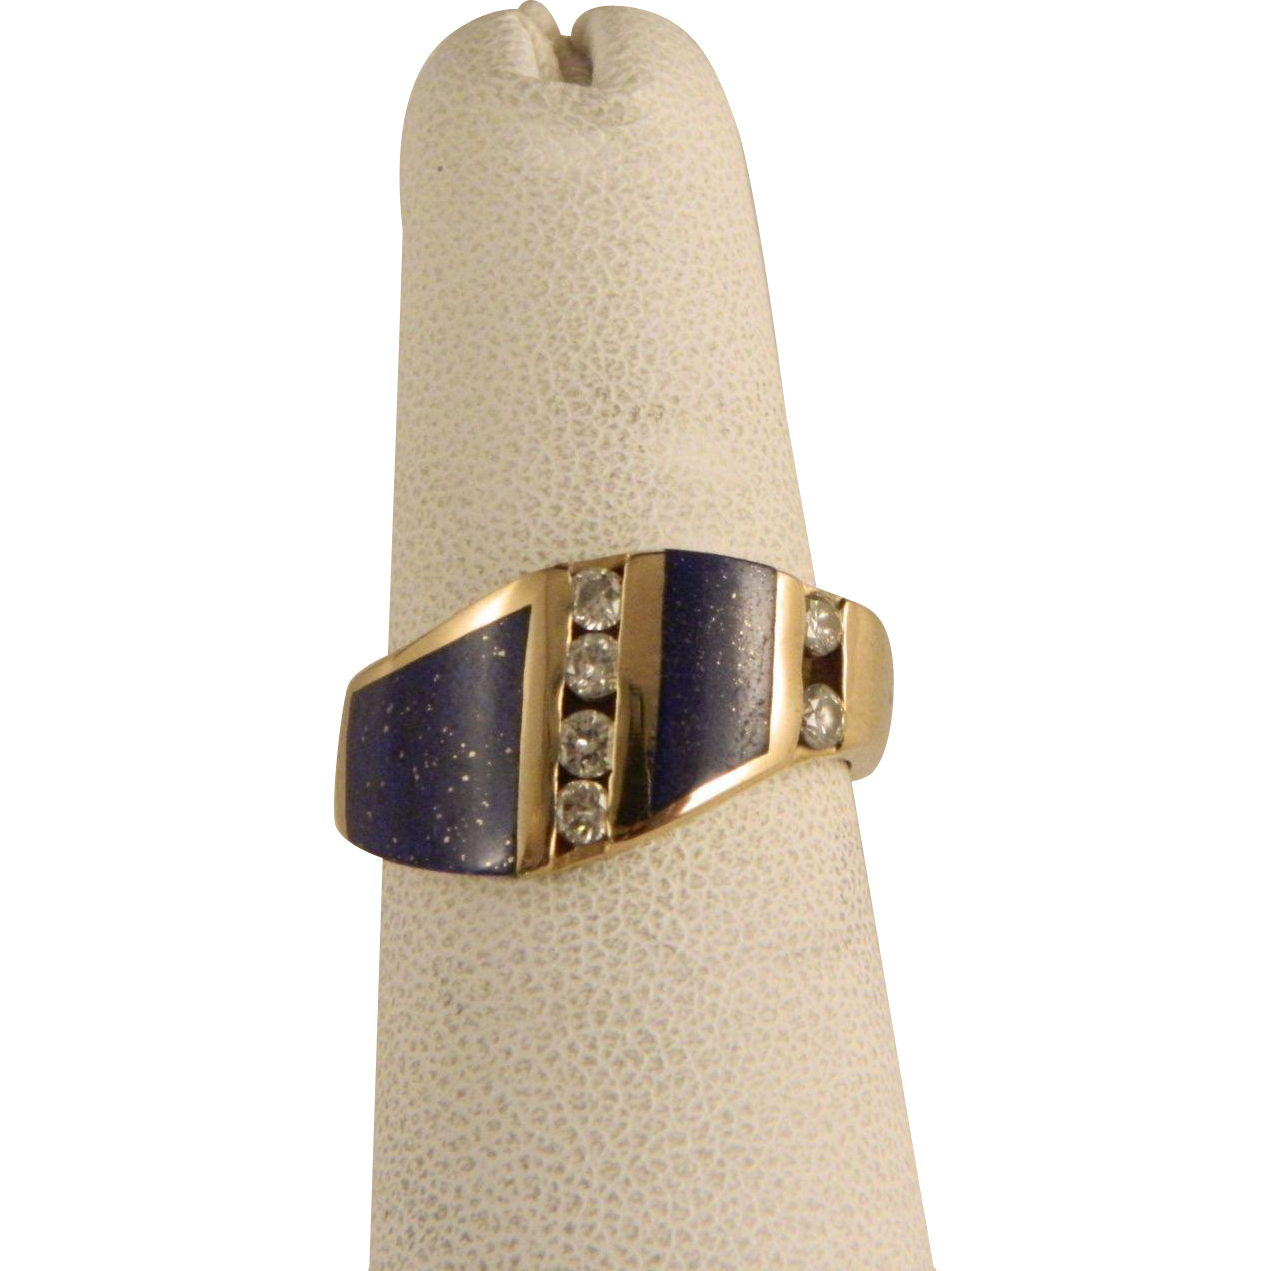 Vintage Gold Diamond and Lapis Lazuli Ring